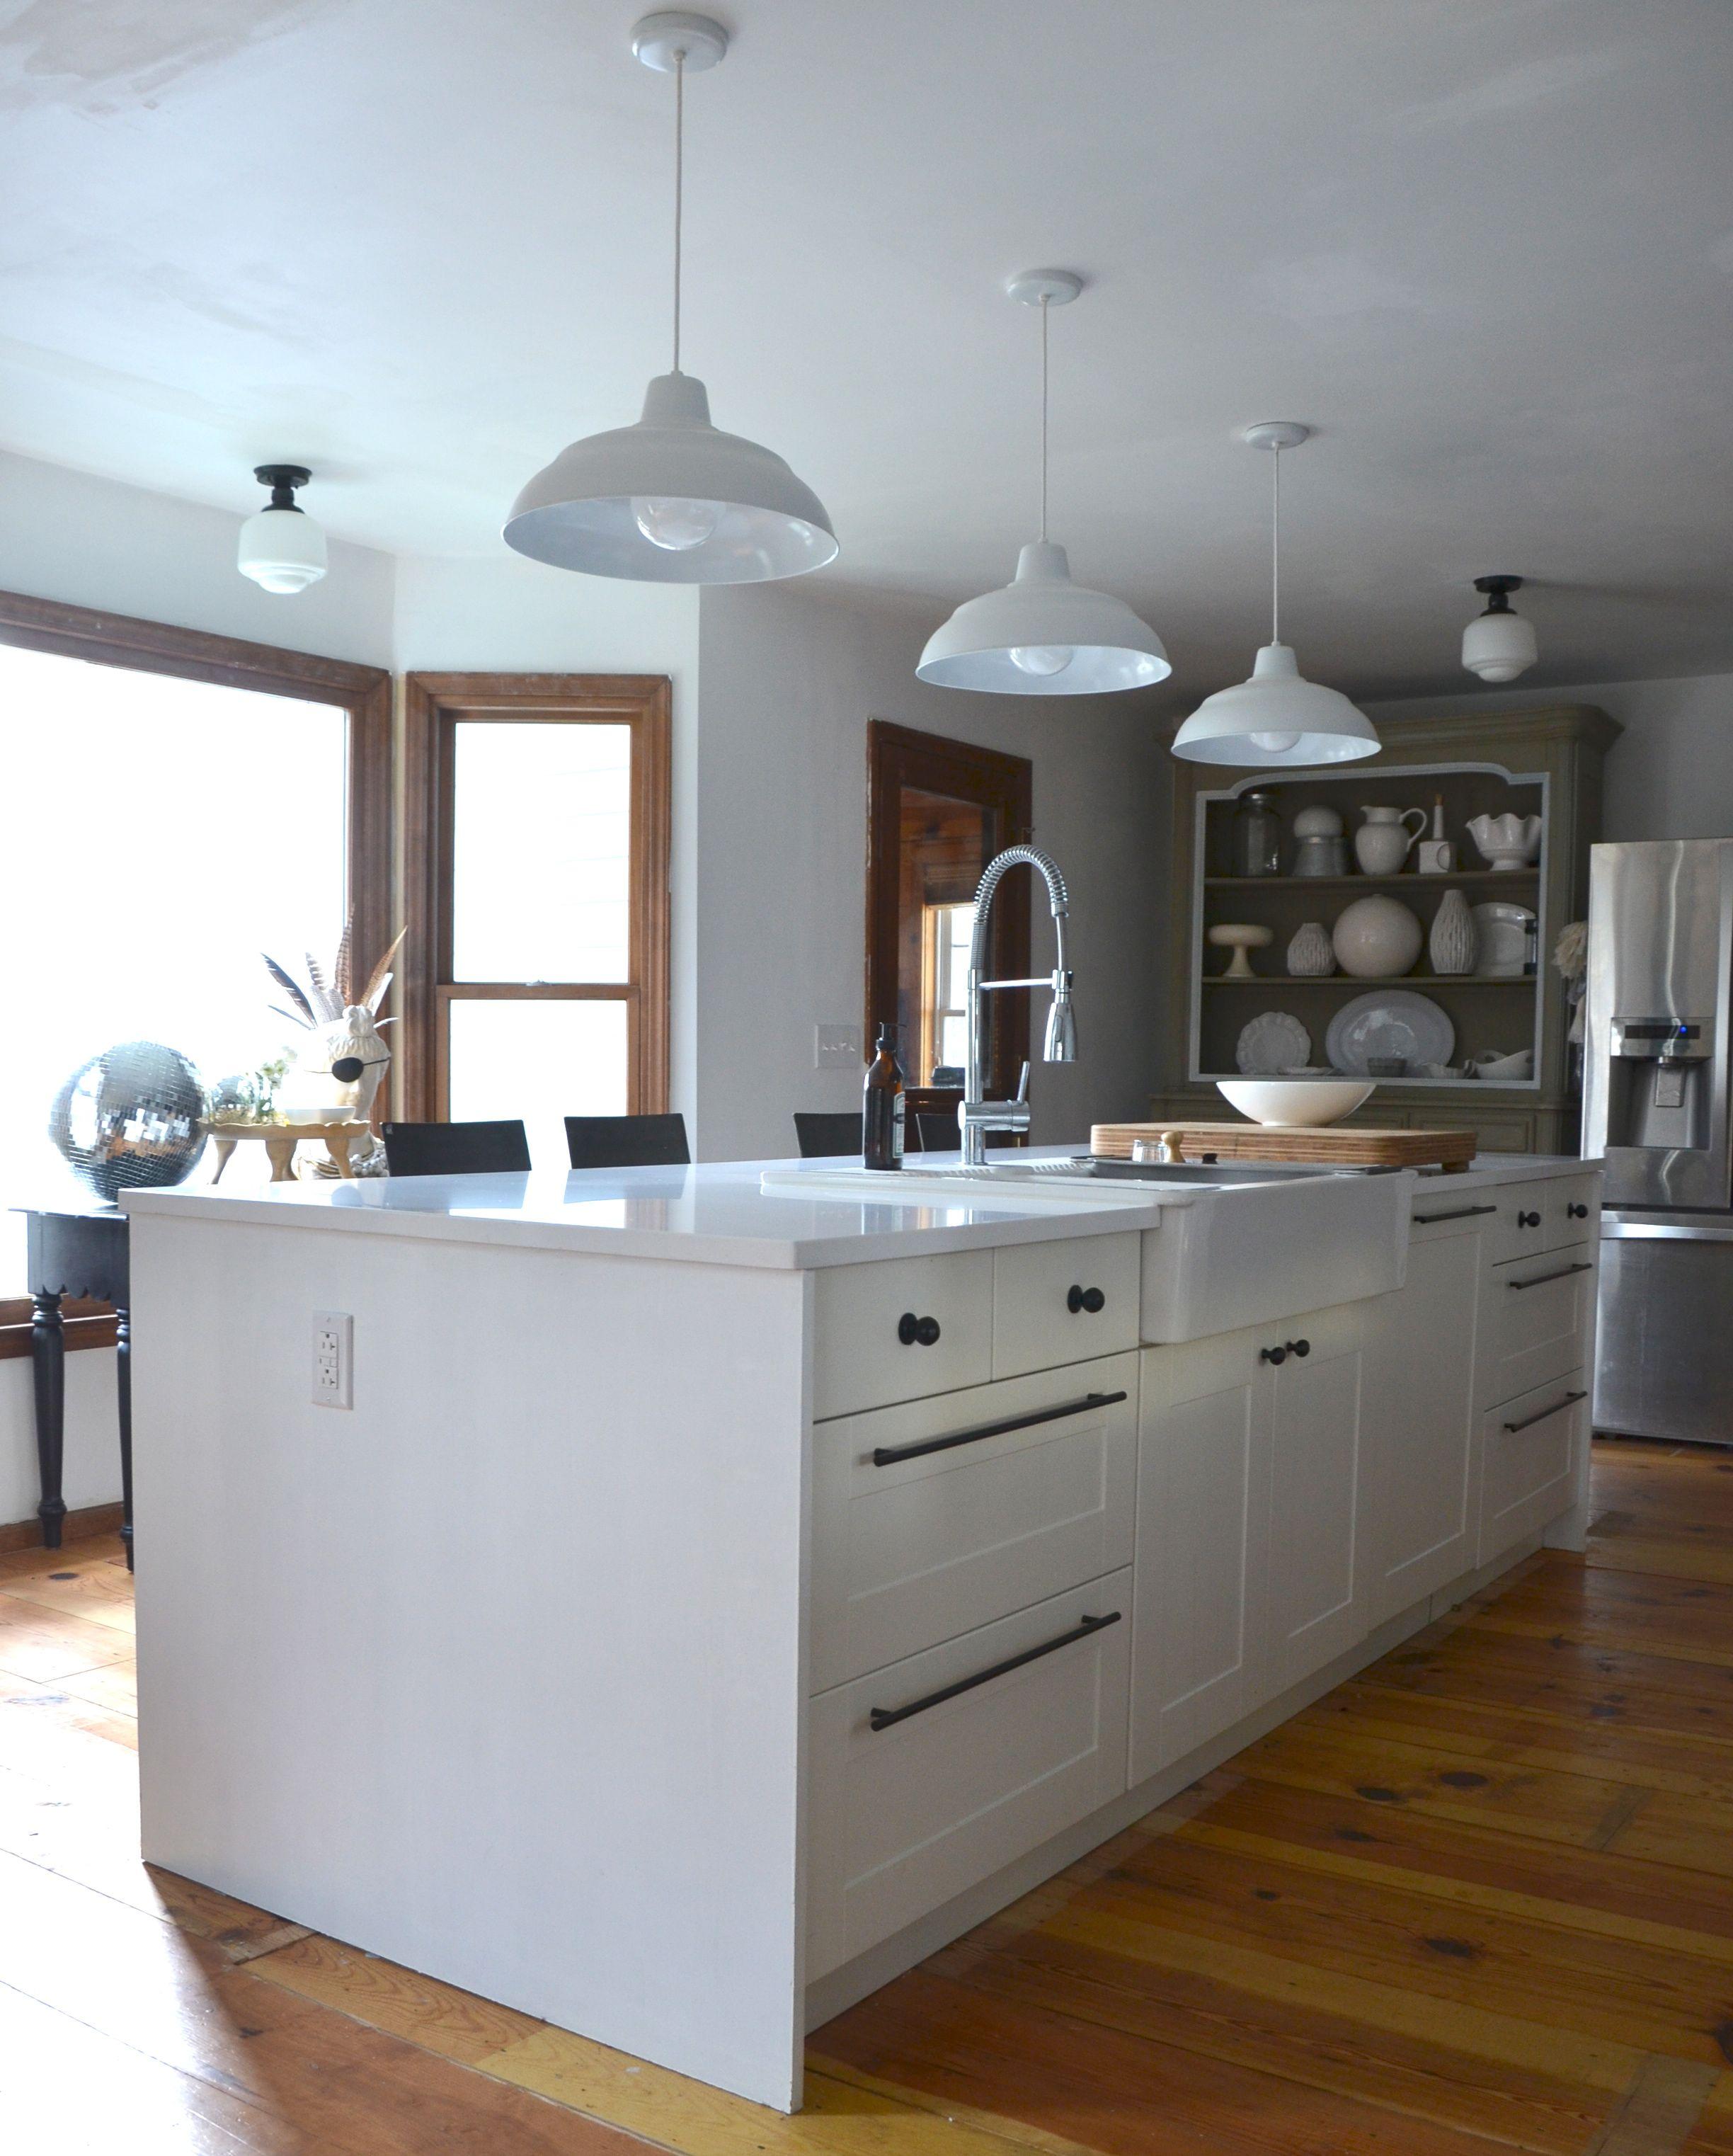 How to Fake A Kitchen Island Waterfall Edge Grey kitchen